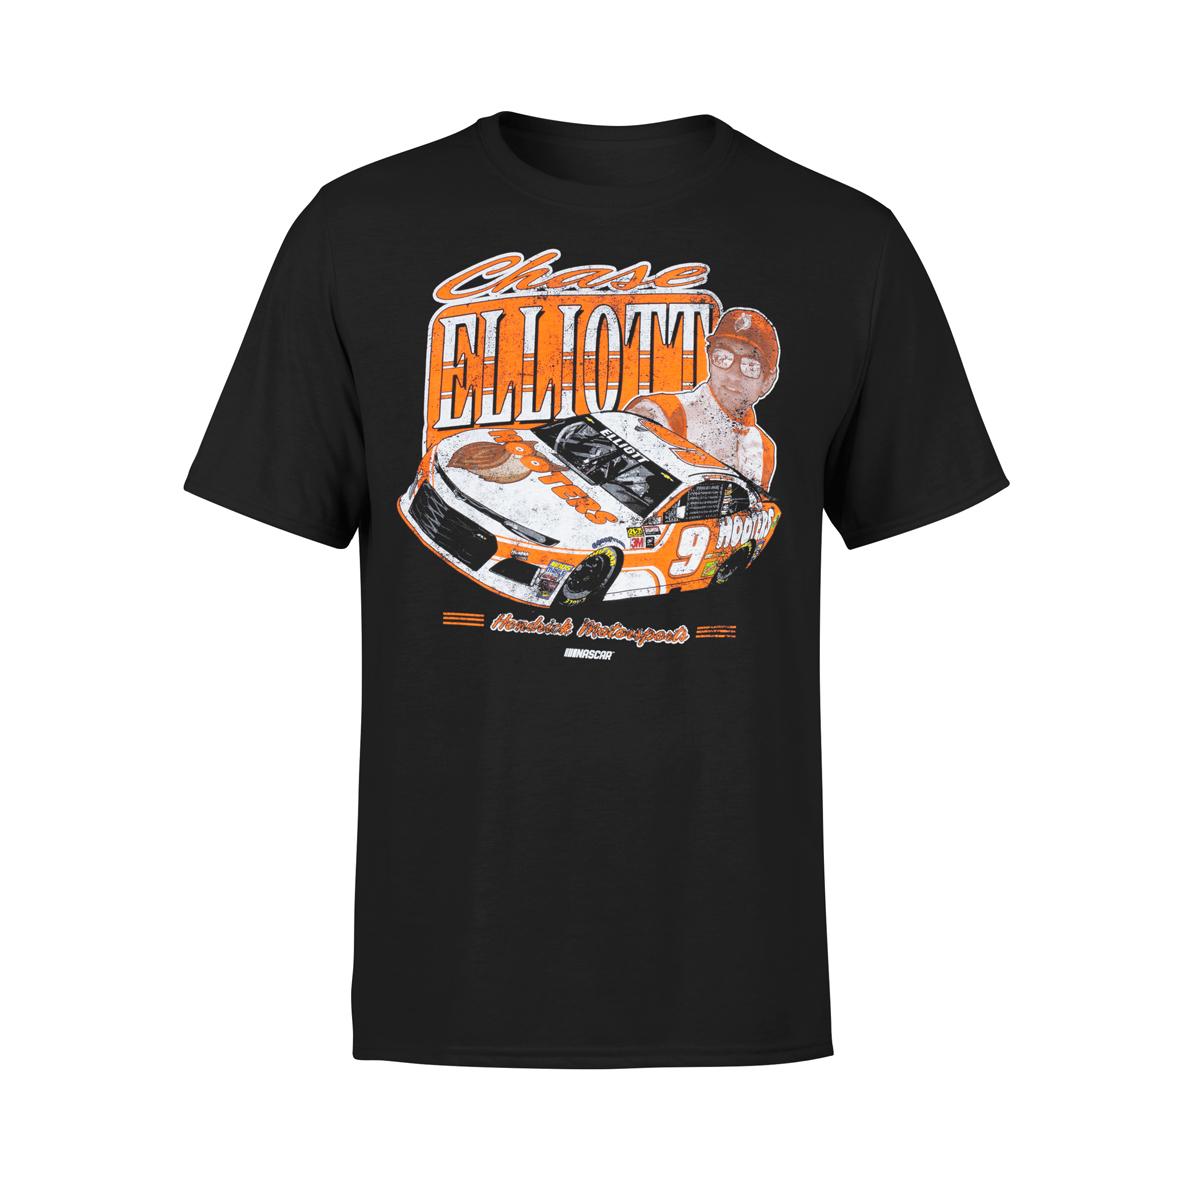 Chase Elliott Hooters Vintage Black T-shirt